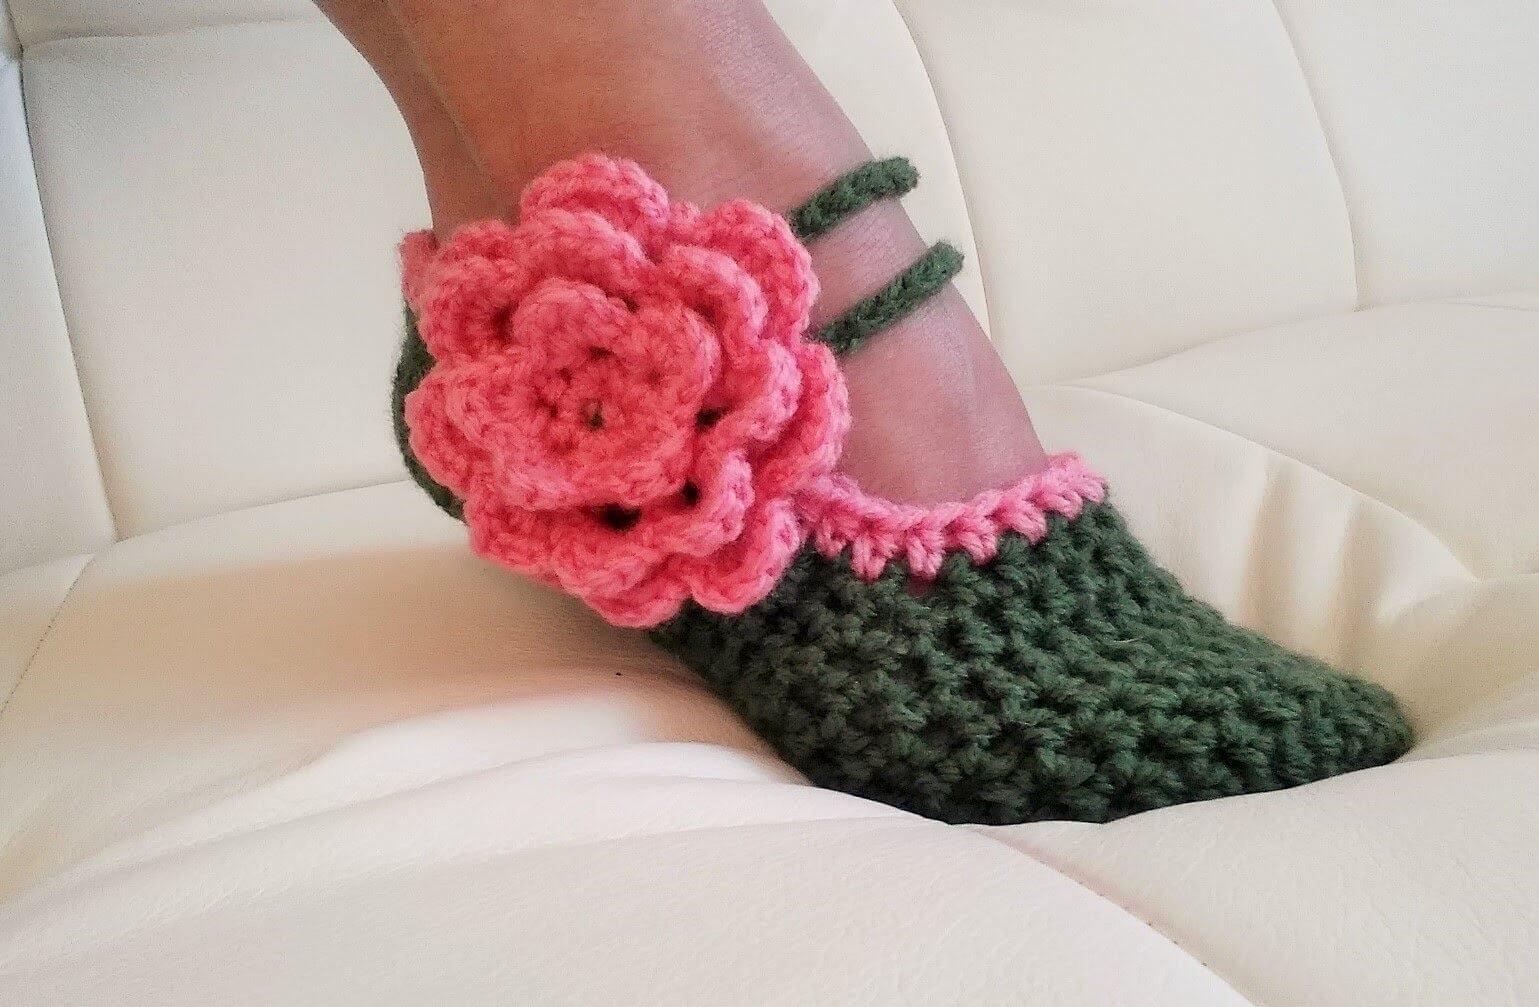 995a912efe4e Crochet converse slippers Free Pattern.